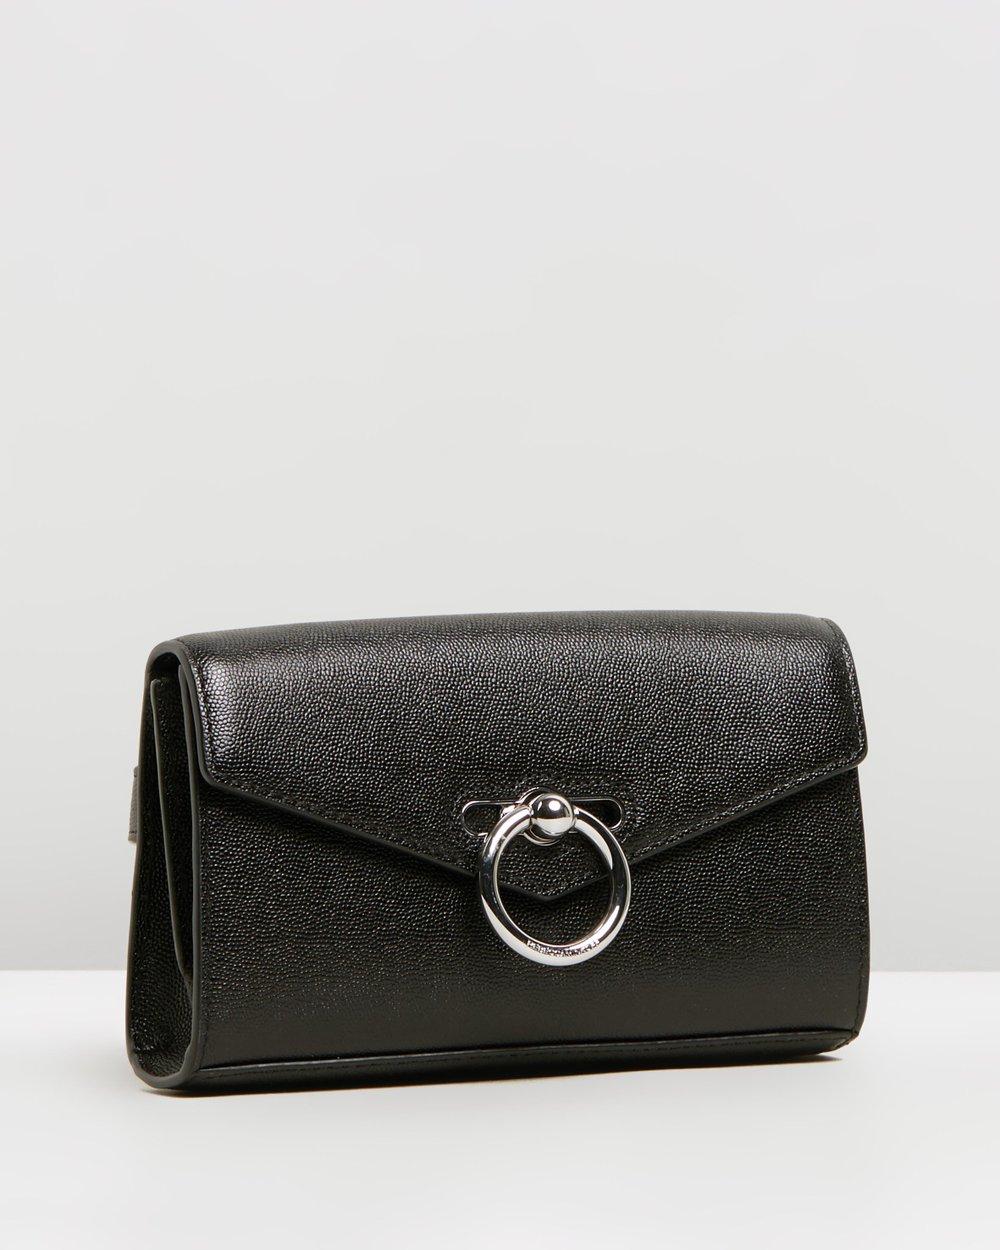 rebecca minkoff Jean belt bag的圖片搜尋結果